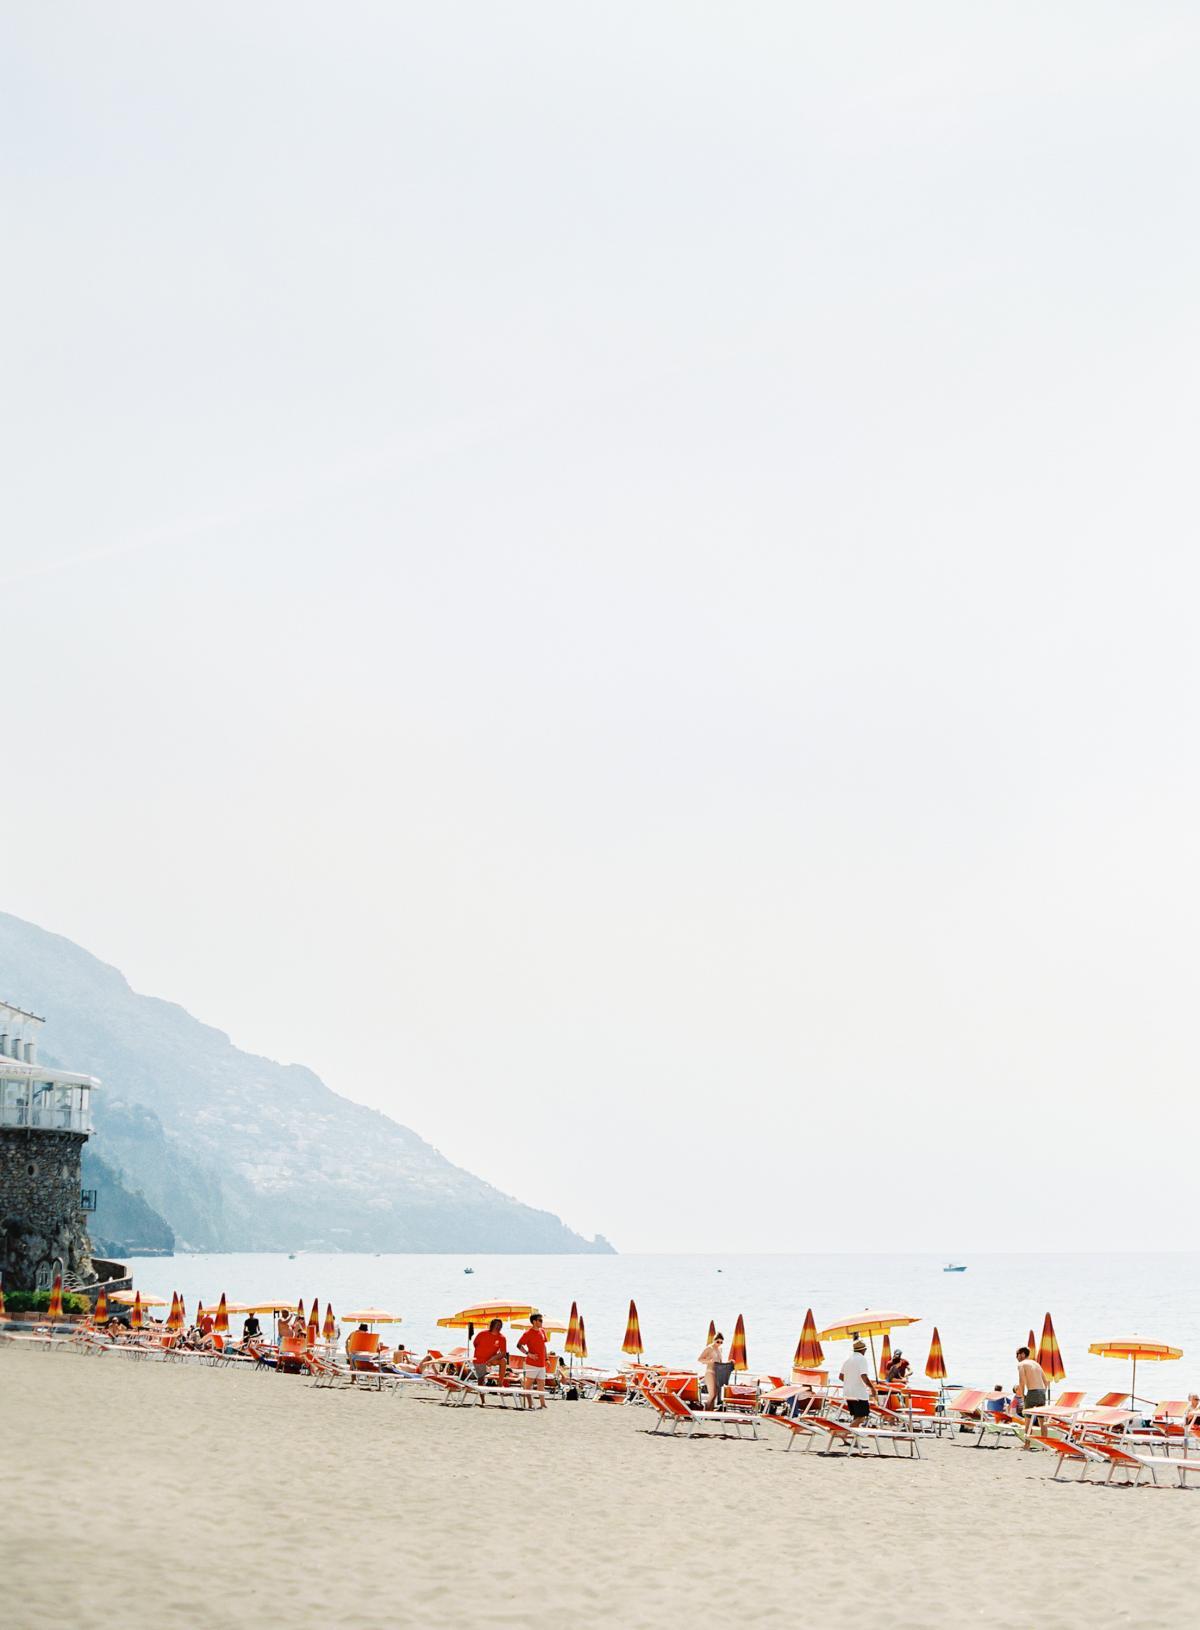 Amalfi Coast Italy Travel Photos By Omalley Photographers 0025